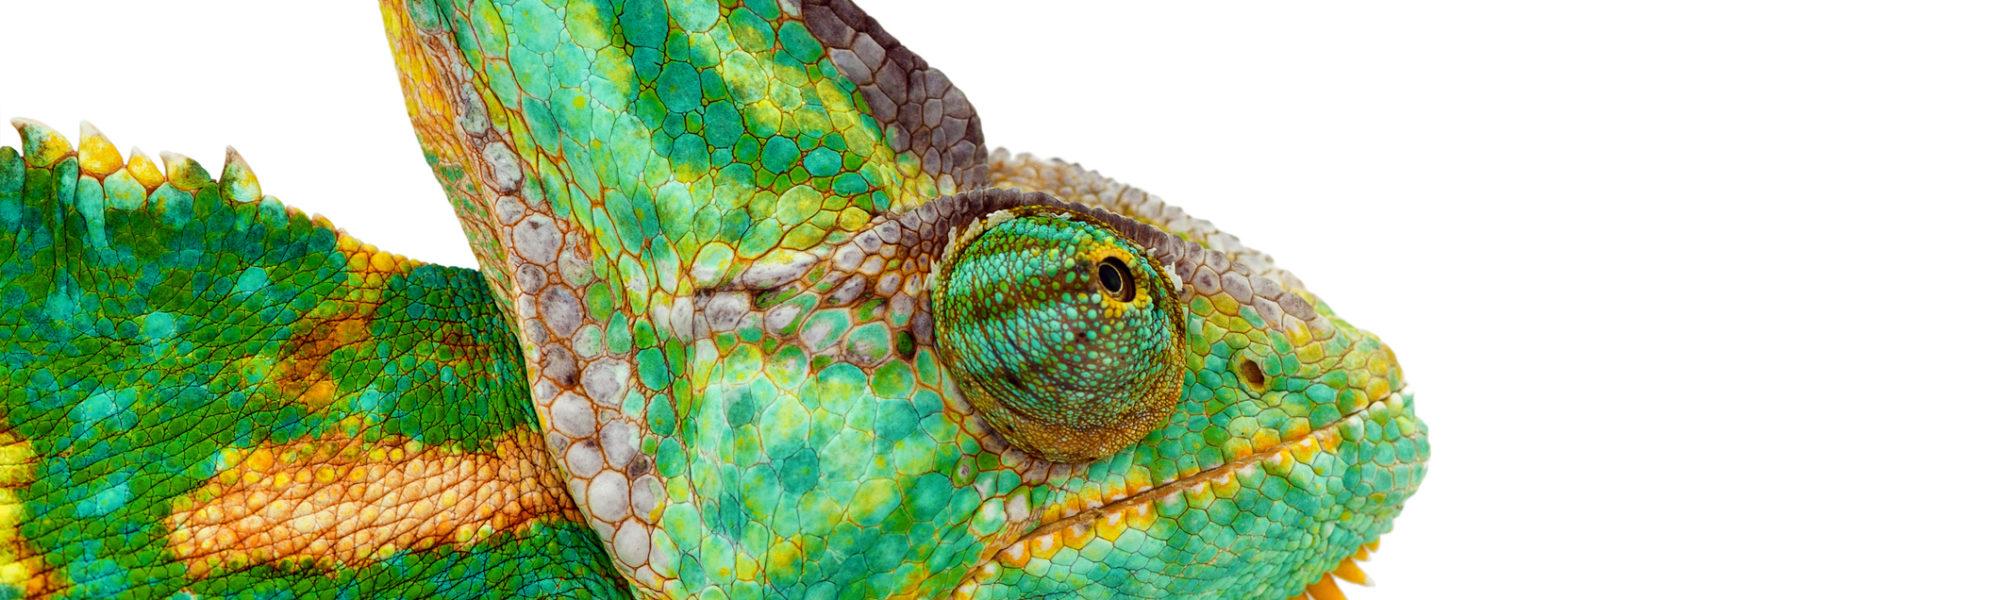 Chamaeleo calyptratus also called veiled cone head or yemen chameleon 1137263926 2124x1416